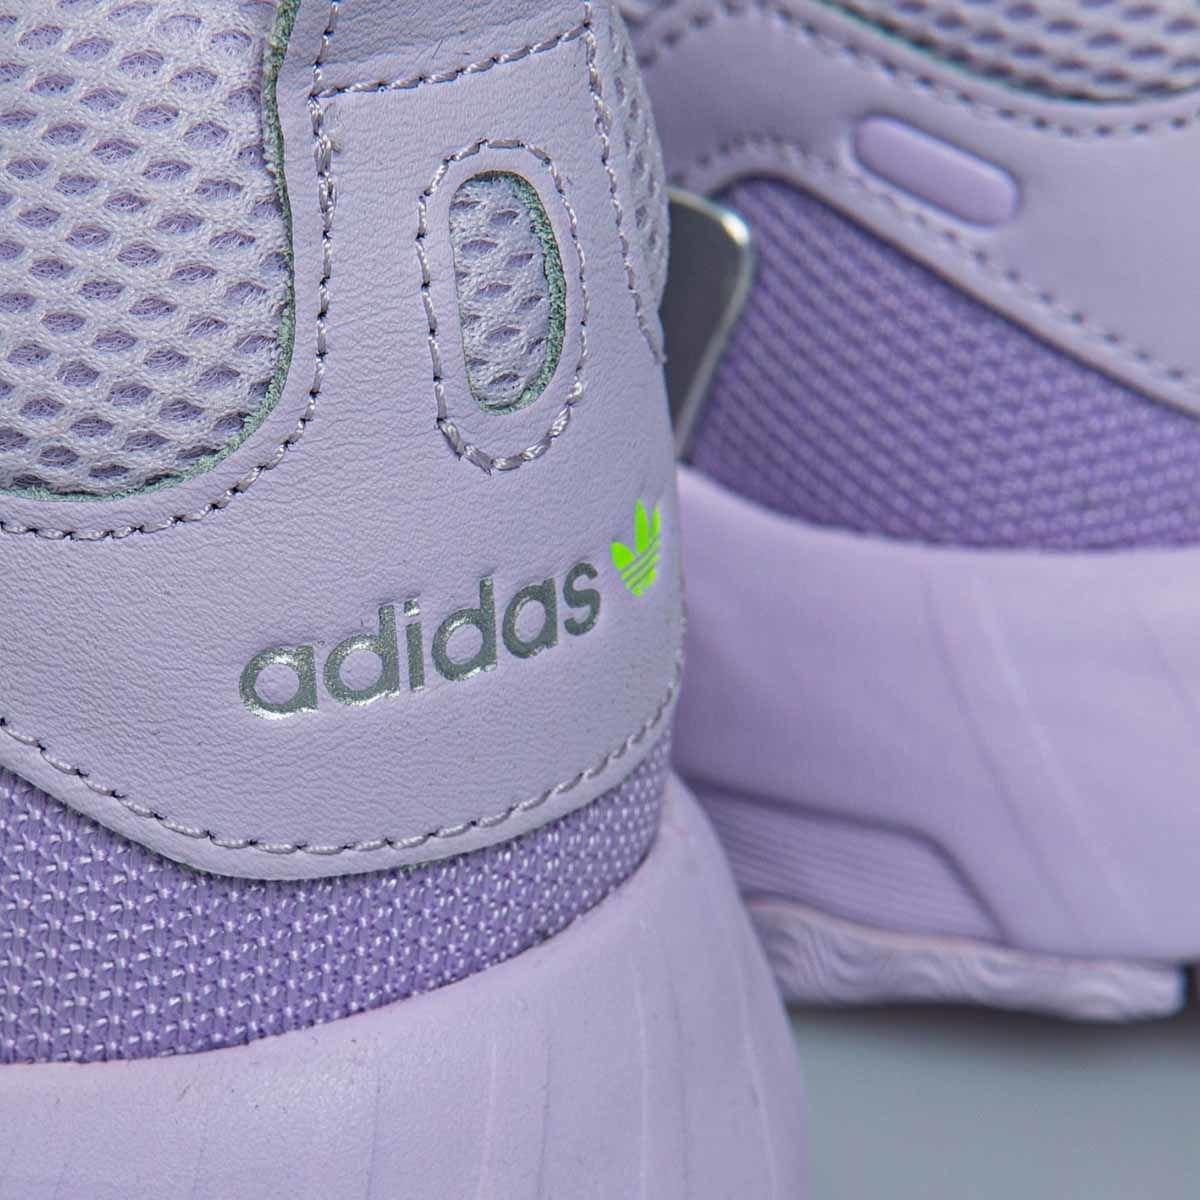 Sneakers WMNS Adidas Originals EQT Gazelle purple tintpurple tintsilver metallic (EF5322)